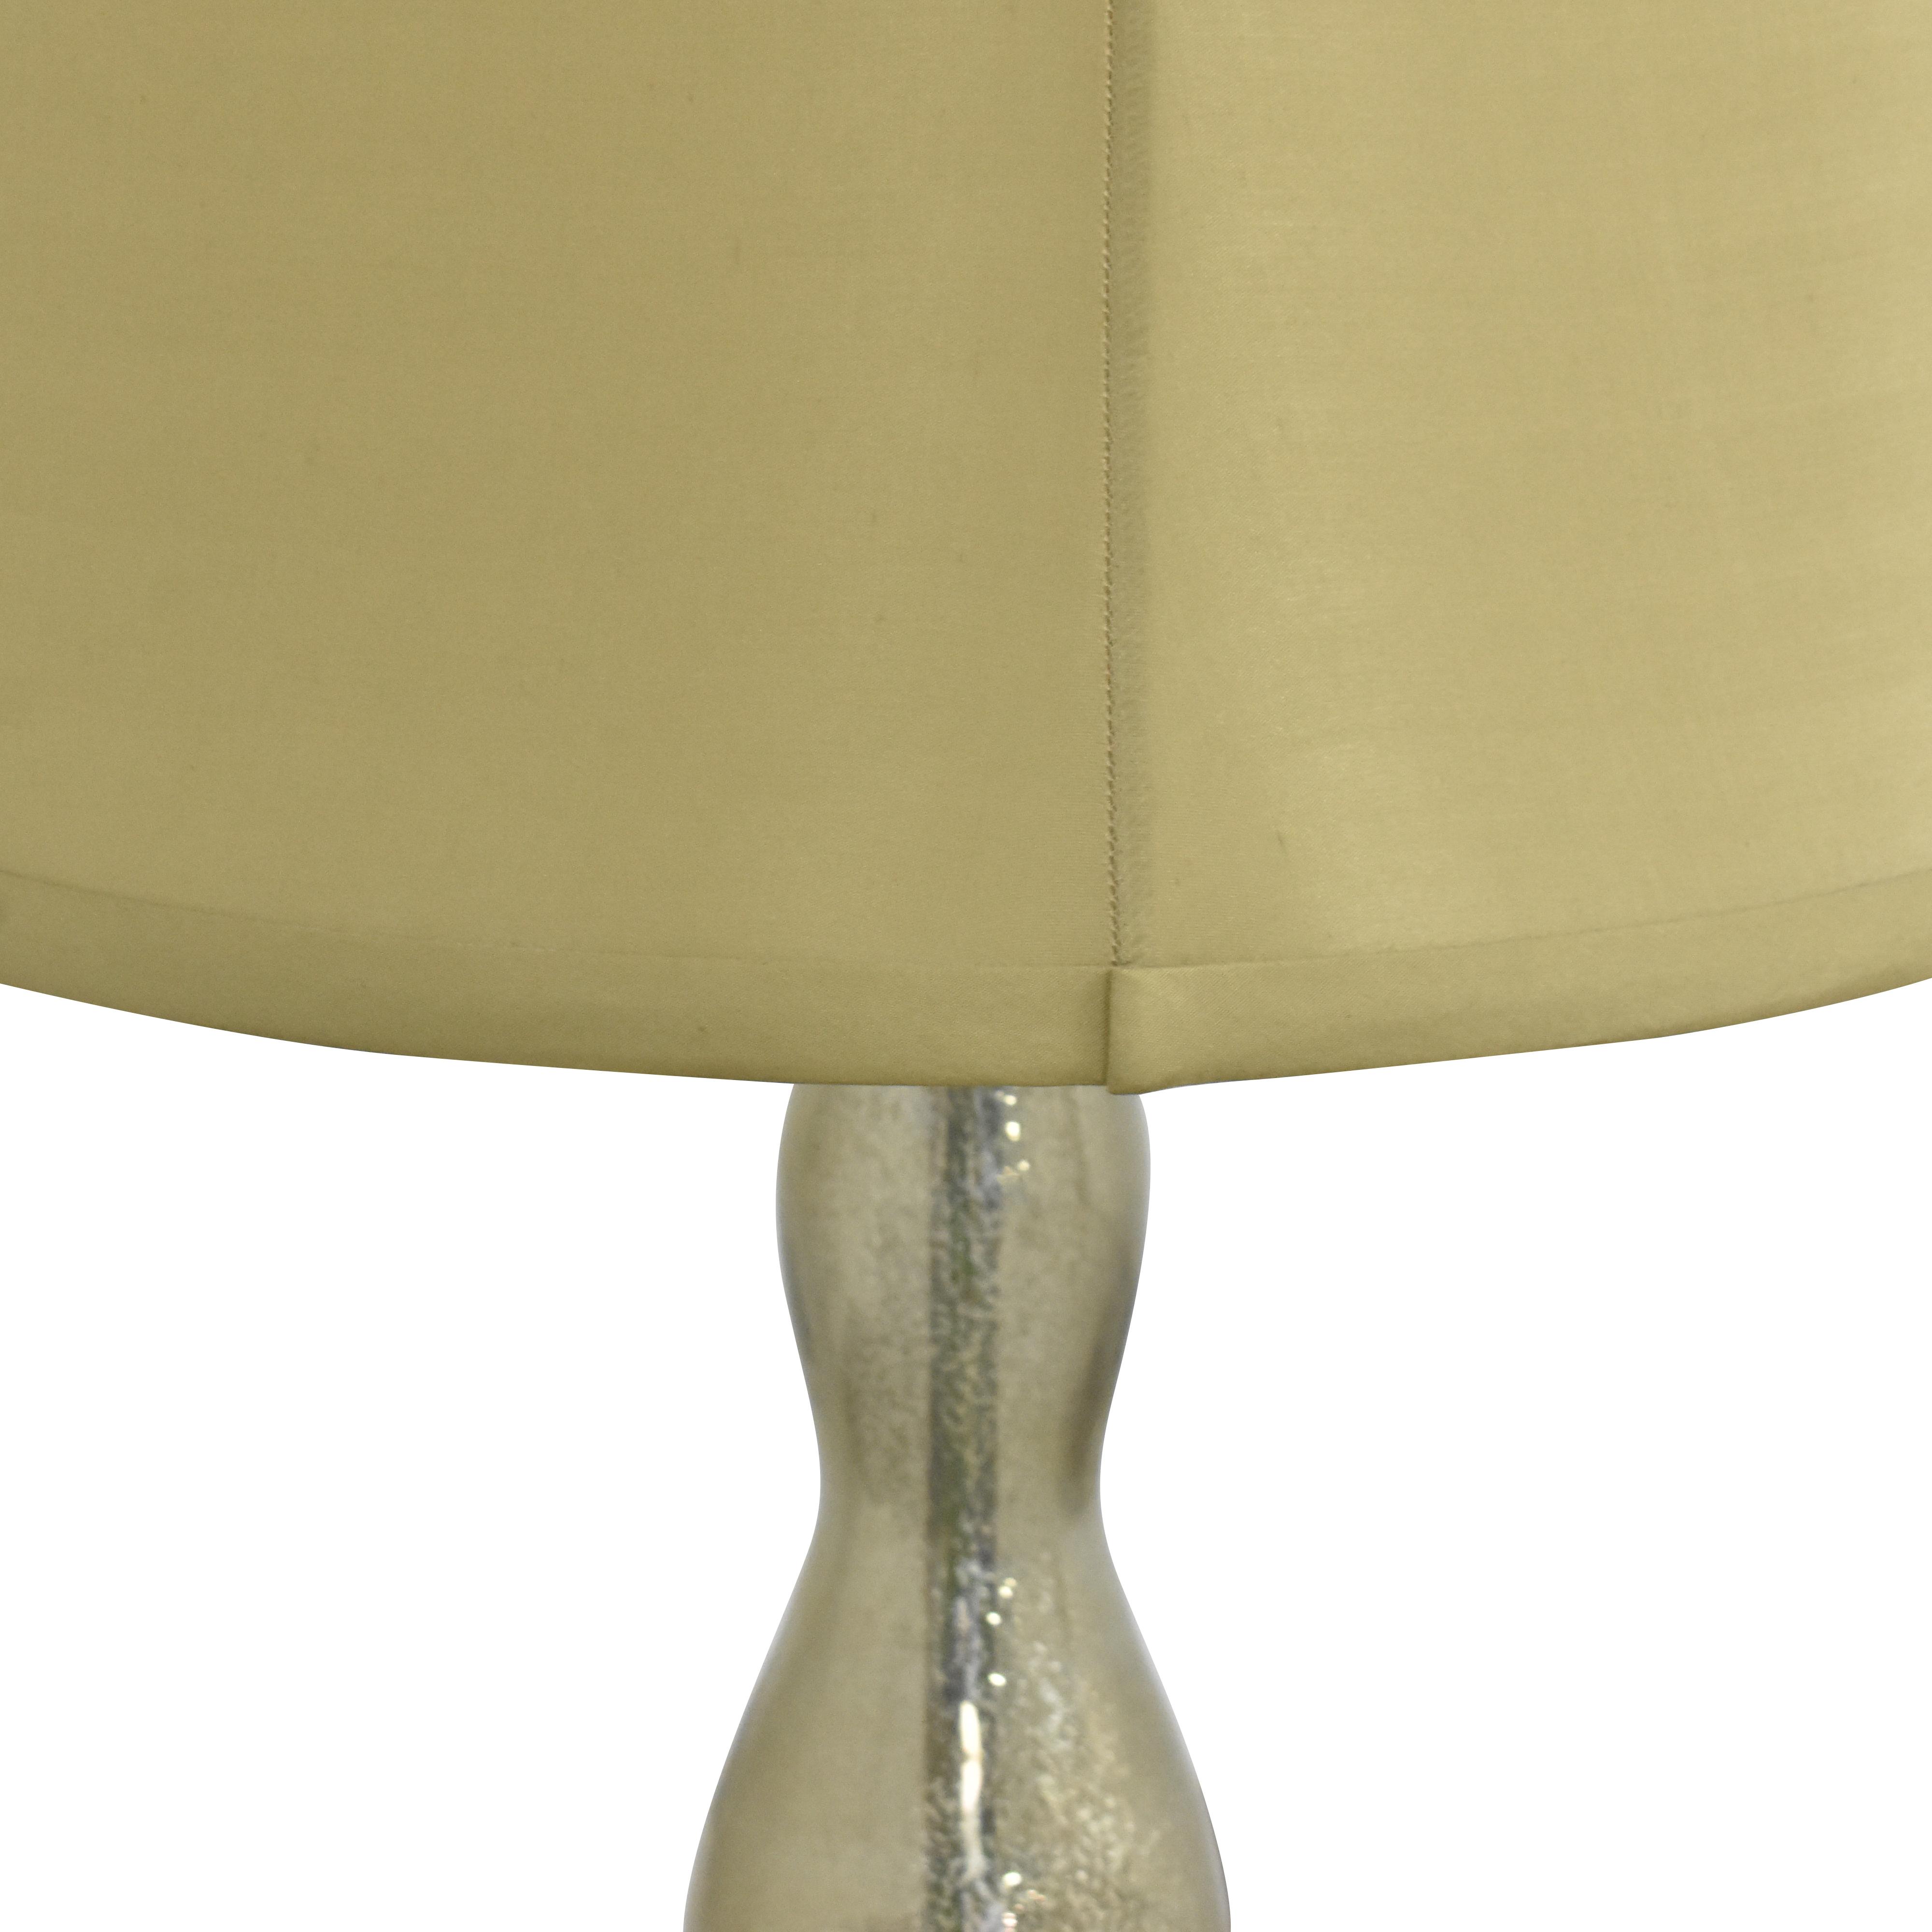 Table Lamp beige